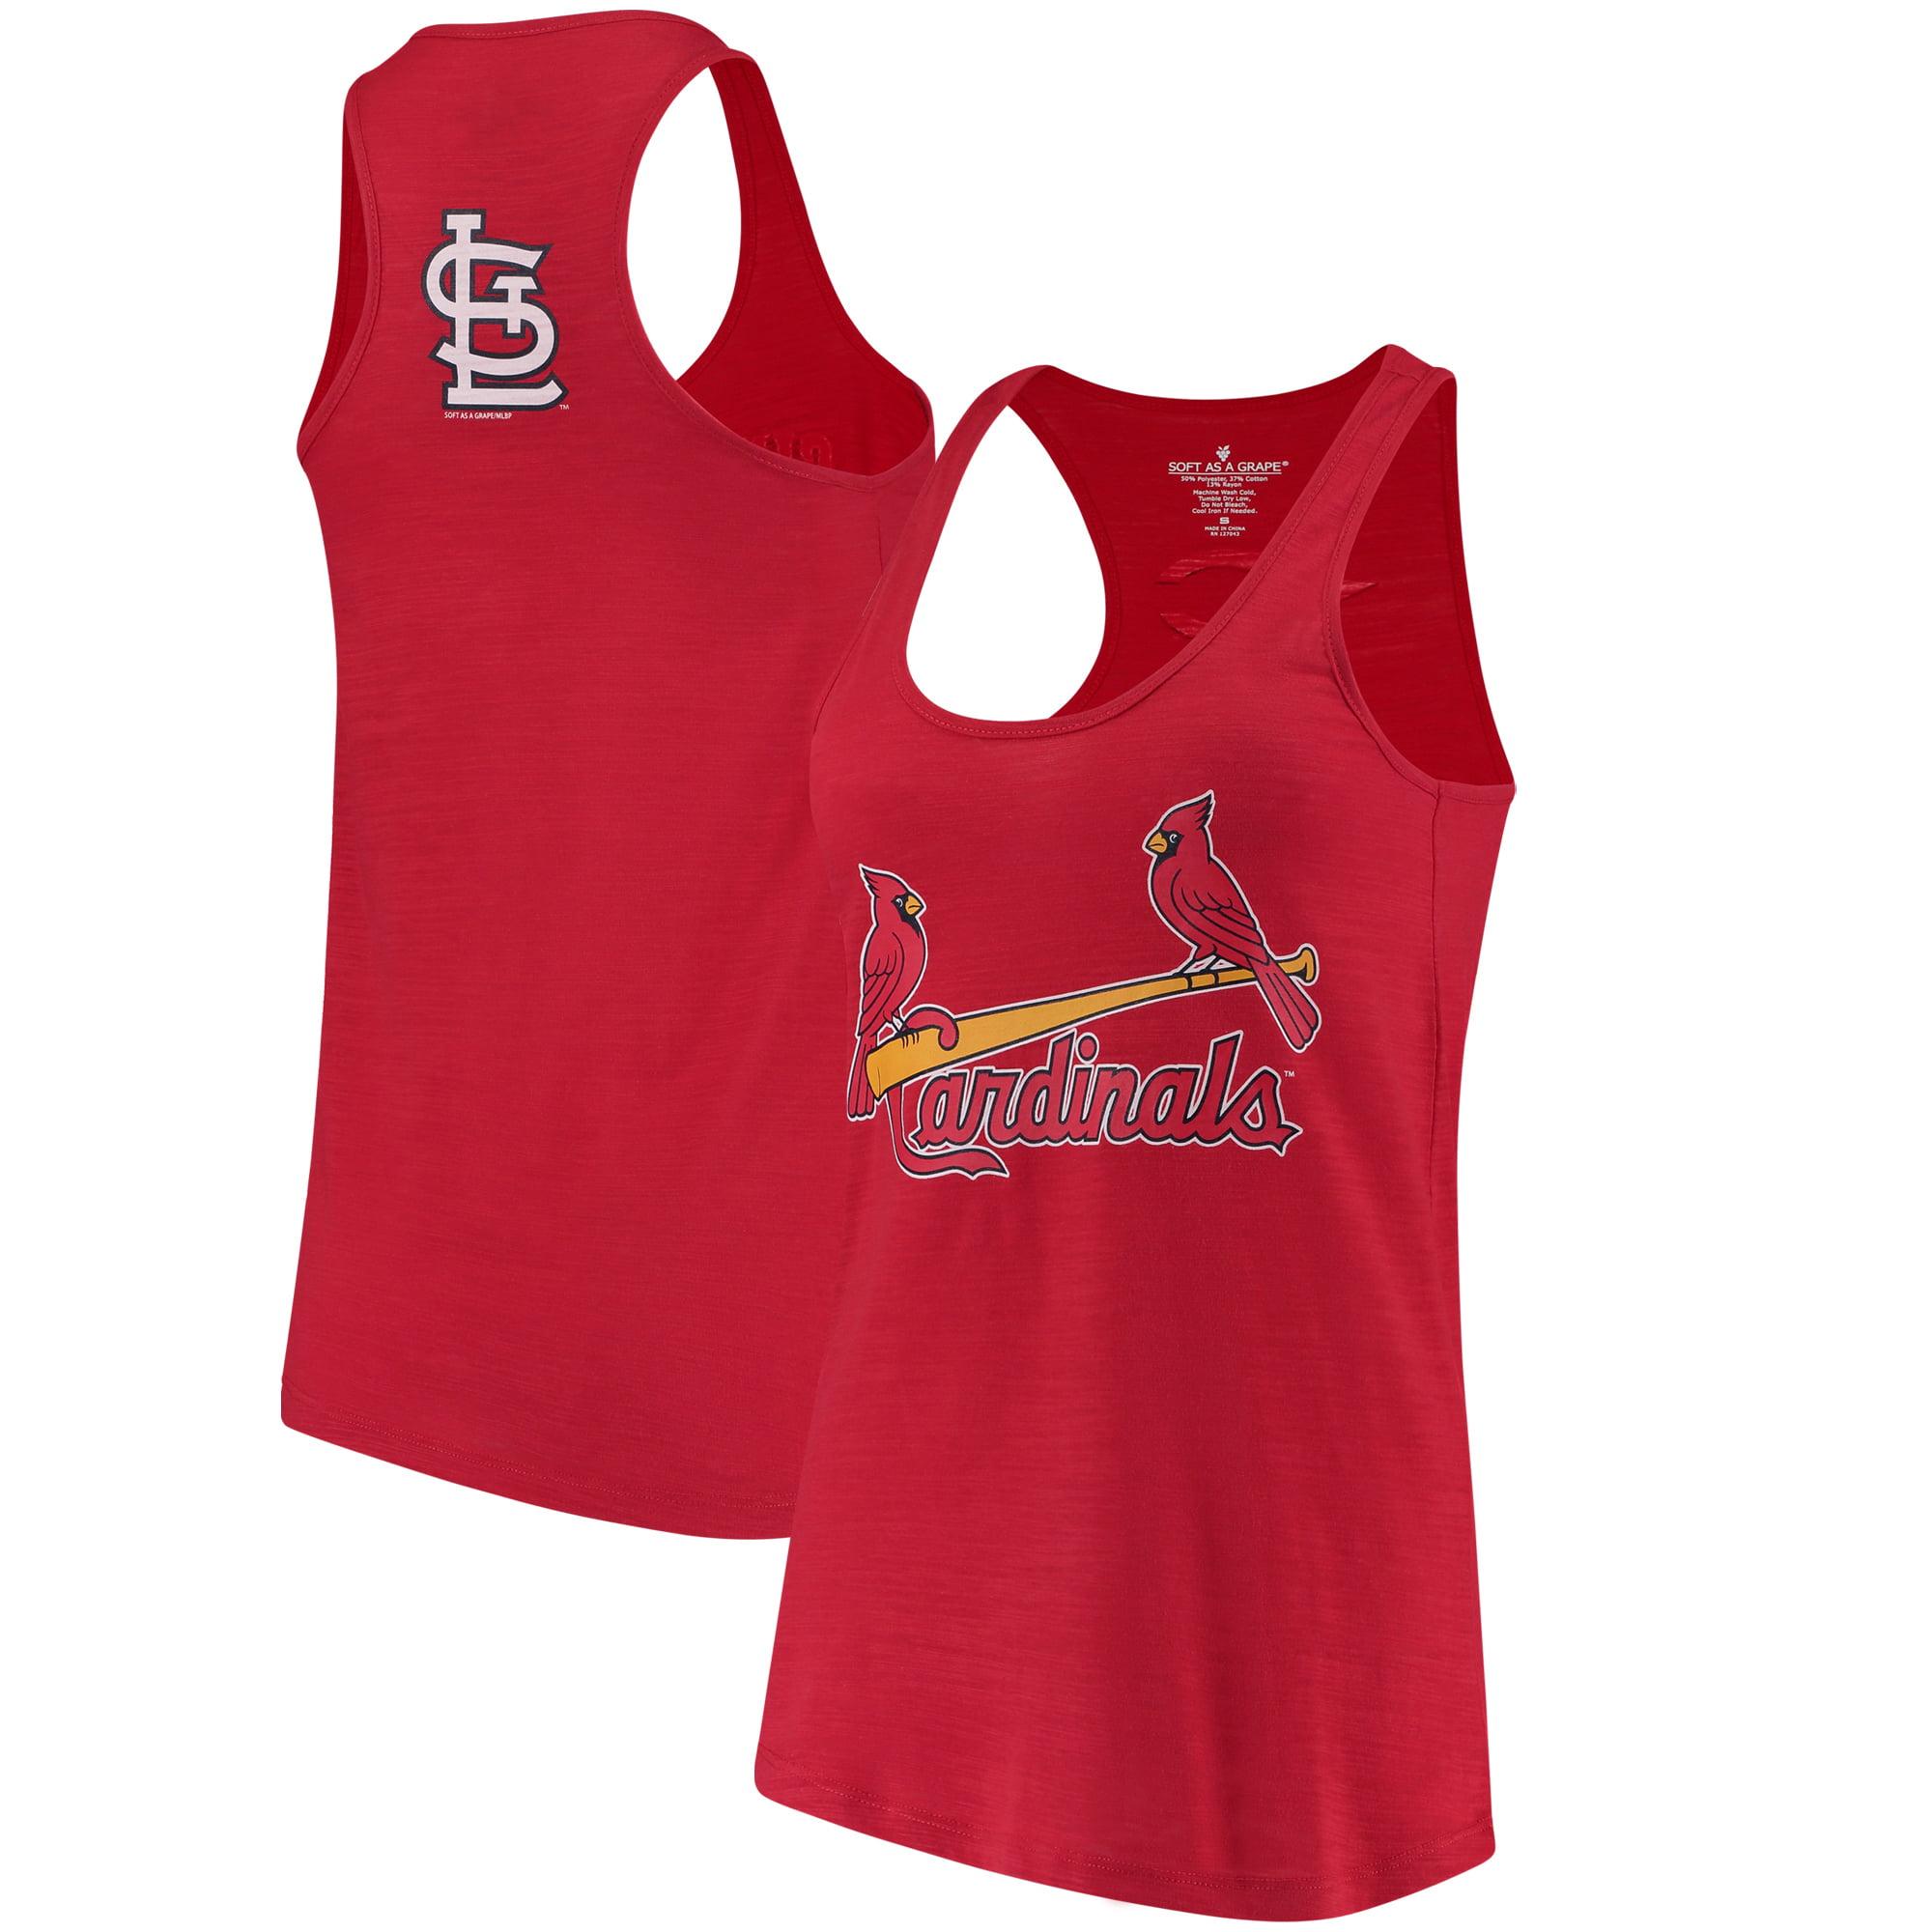 St. Louis Cardinals Soft As A Grape Women's Front & Back Tri-Blend Racerback Tank Top - Red